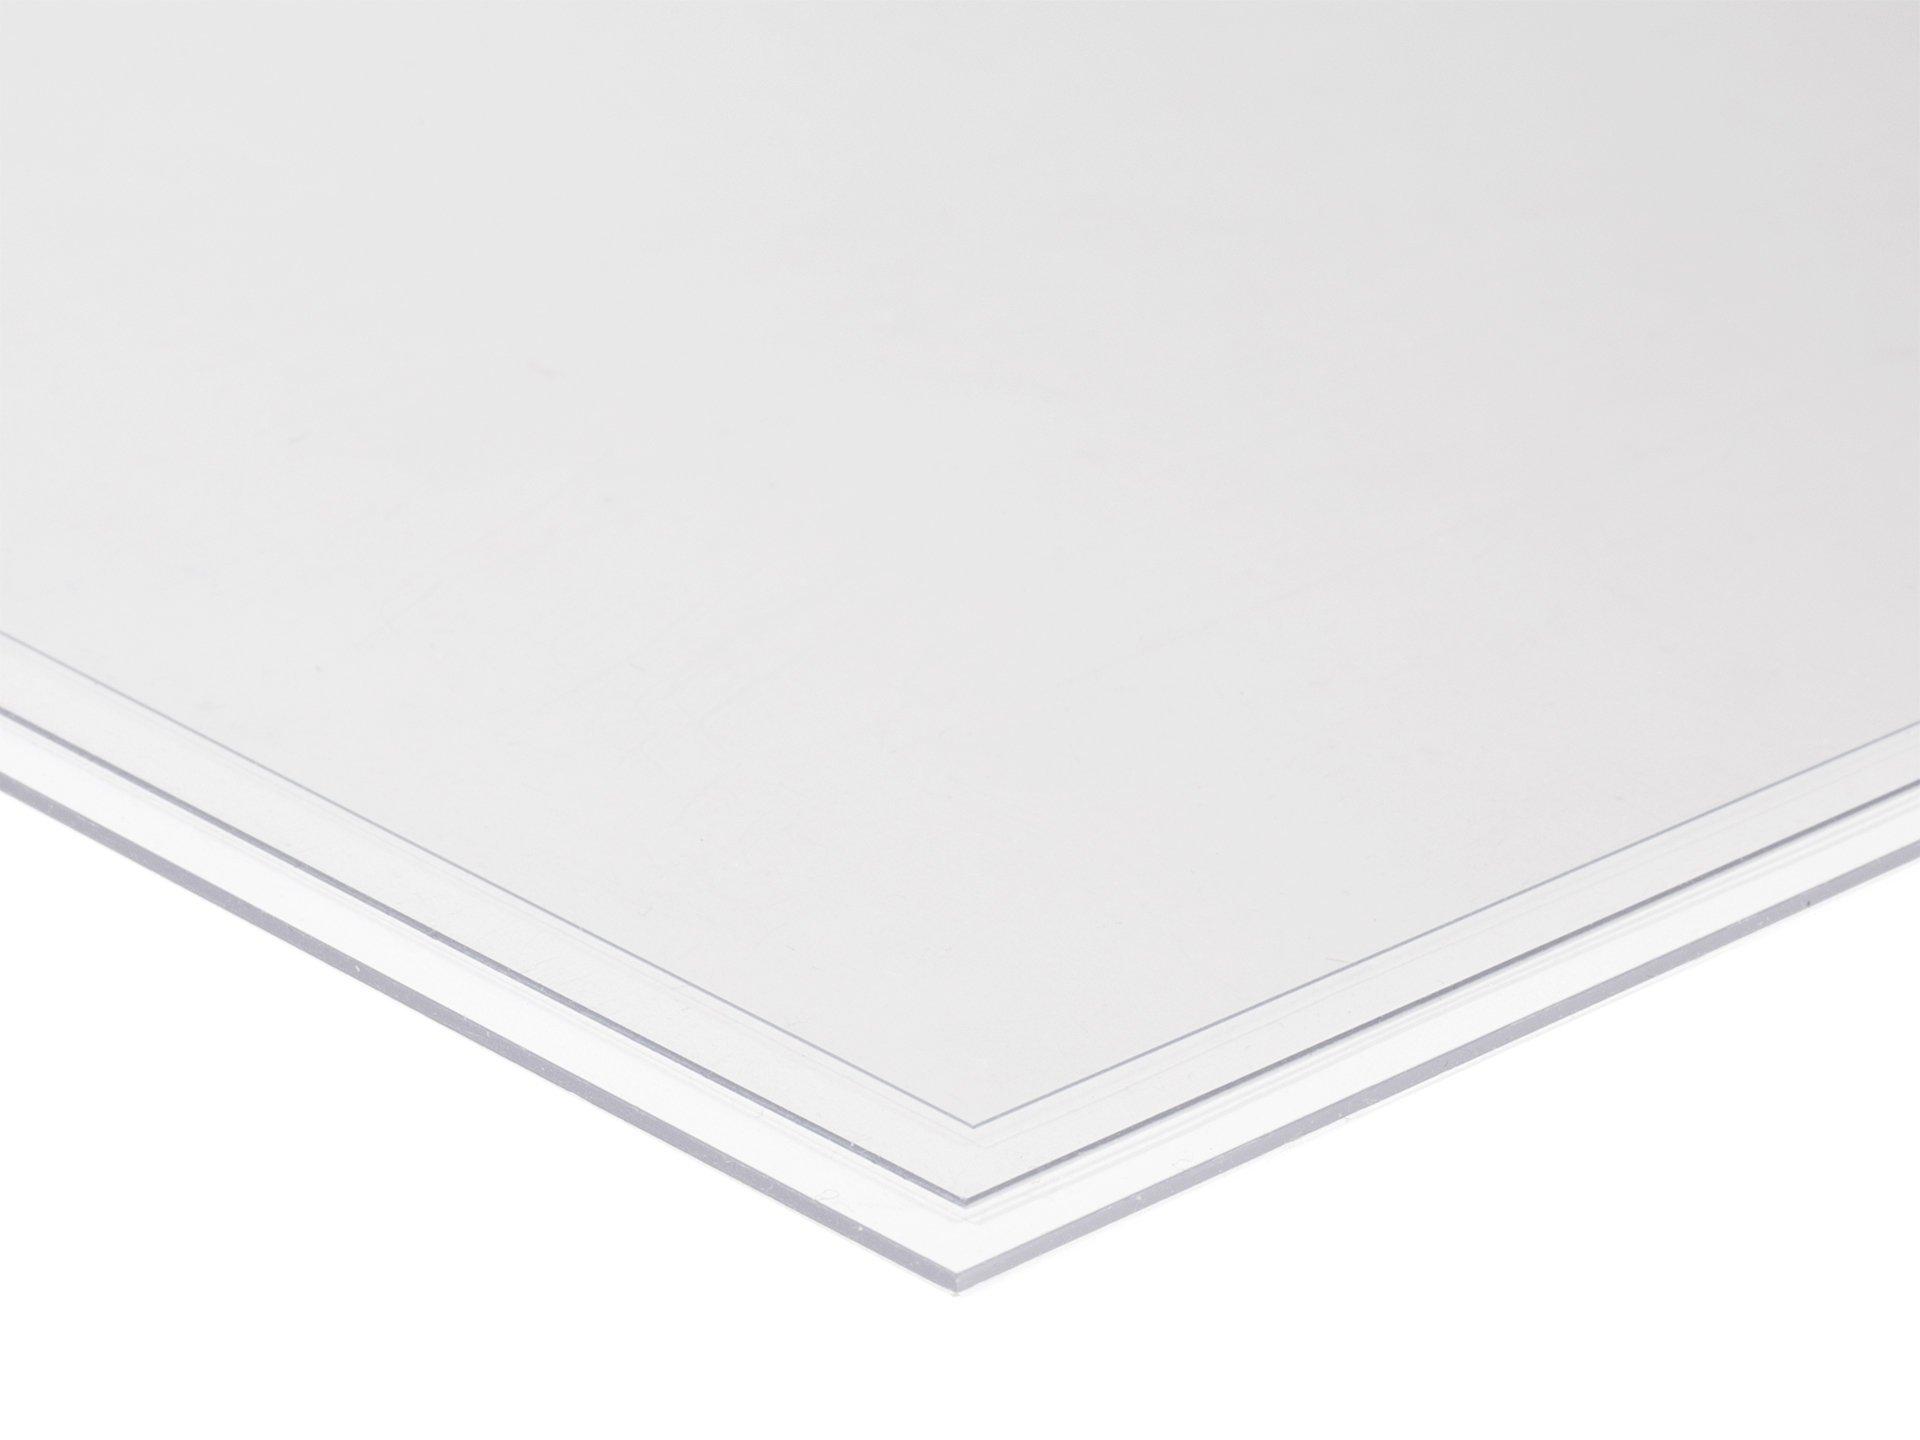 pvc hart transparent farblos online kaufen modulor. Black Bedroom Furniture Sets. Home Design Ideas